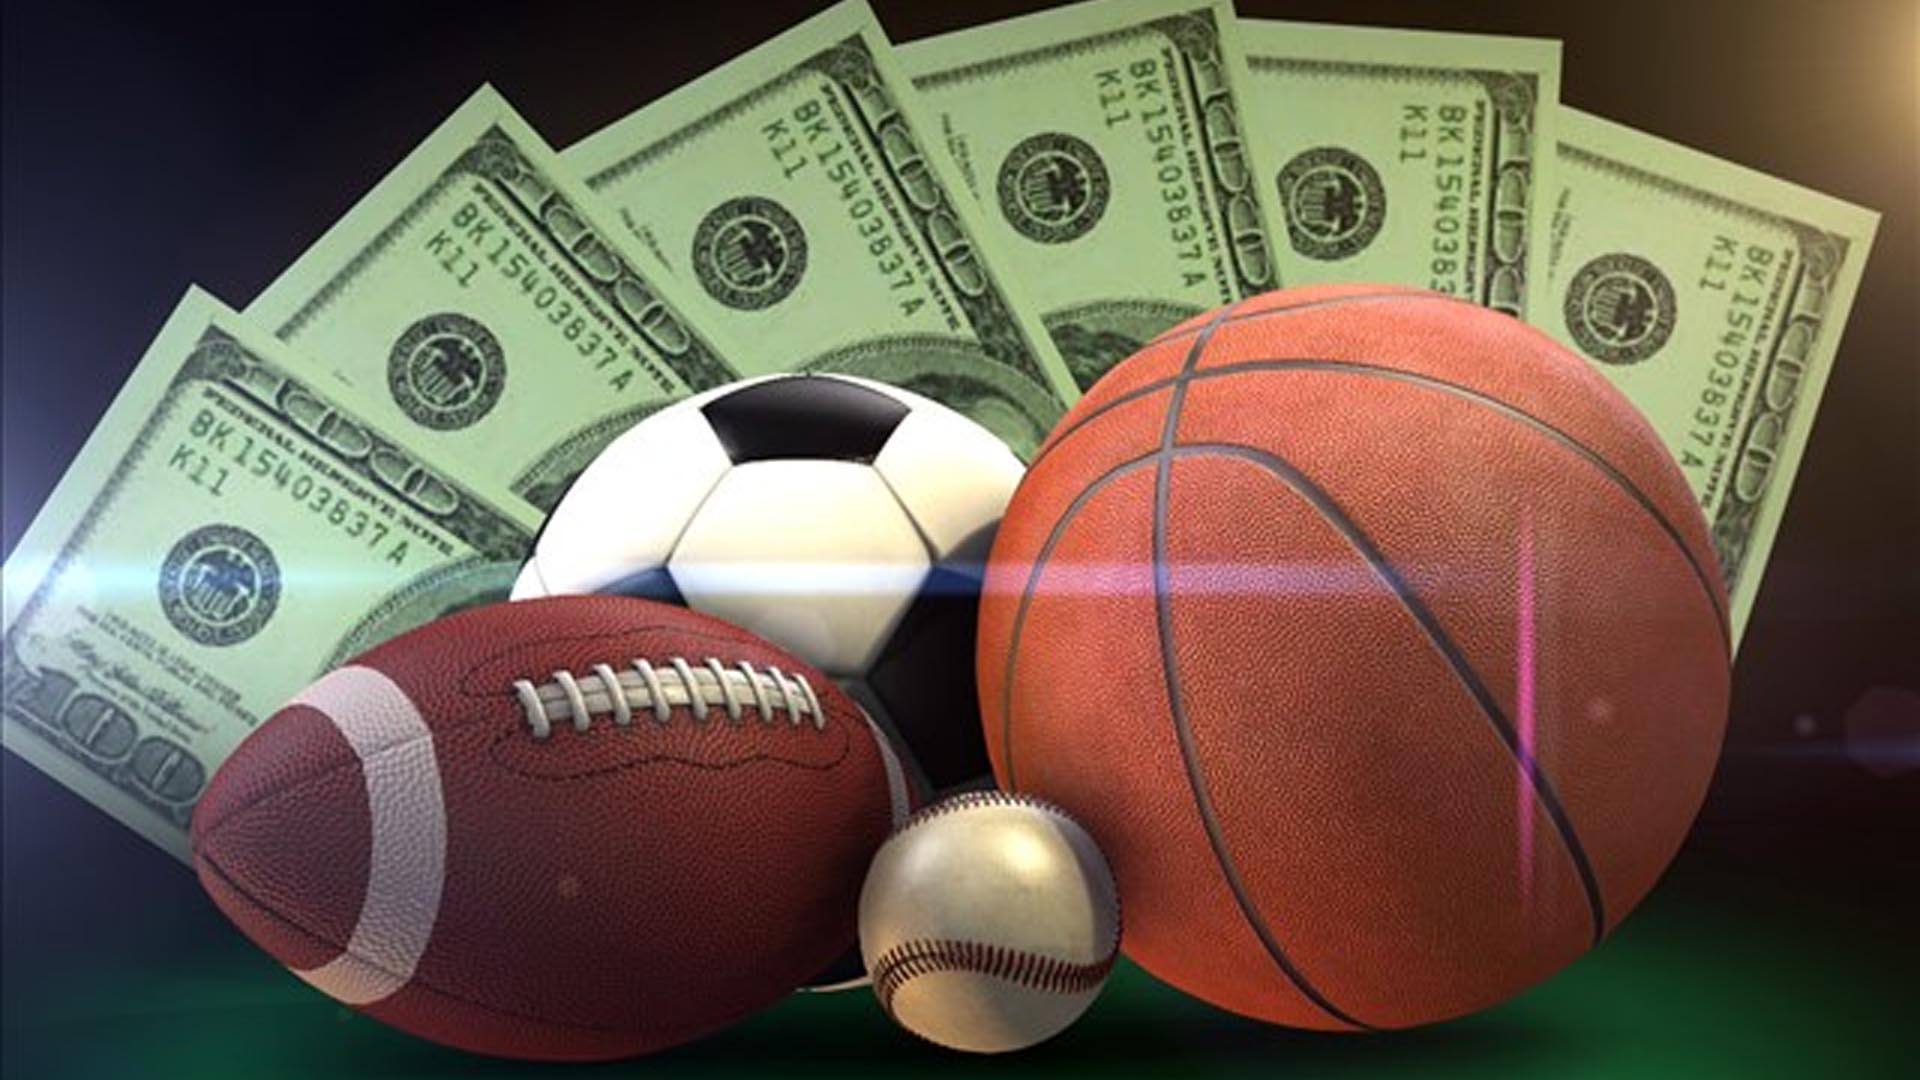 Hd sports betting mabapa mining bitcoins